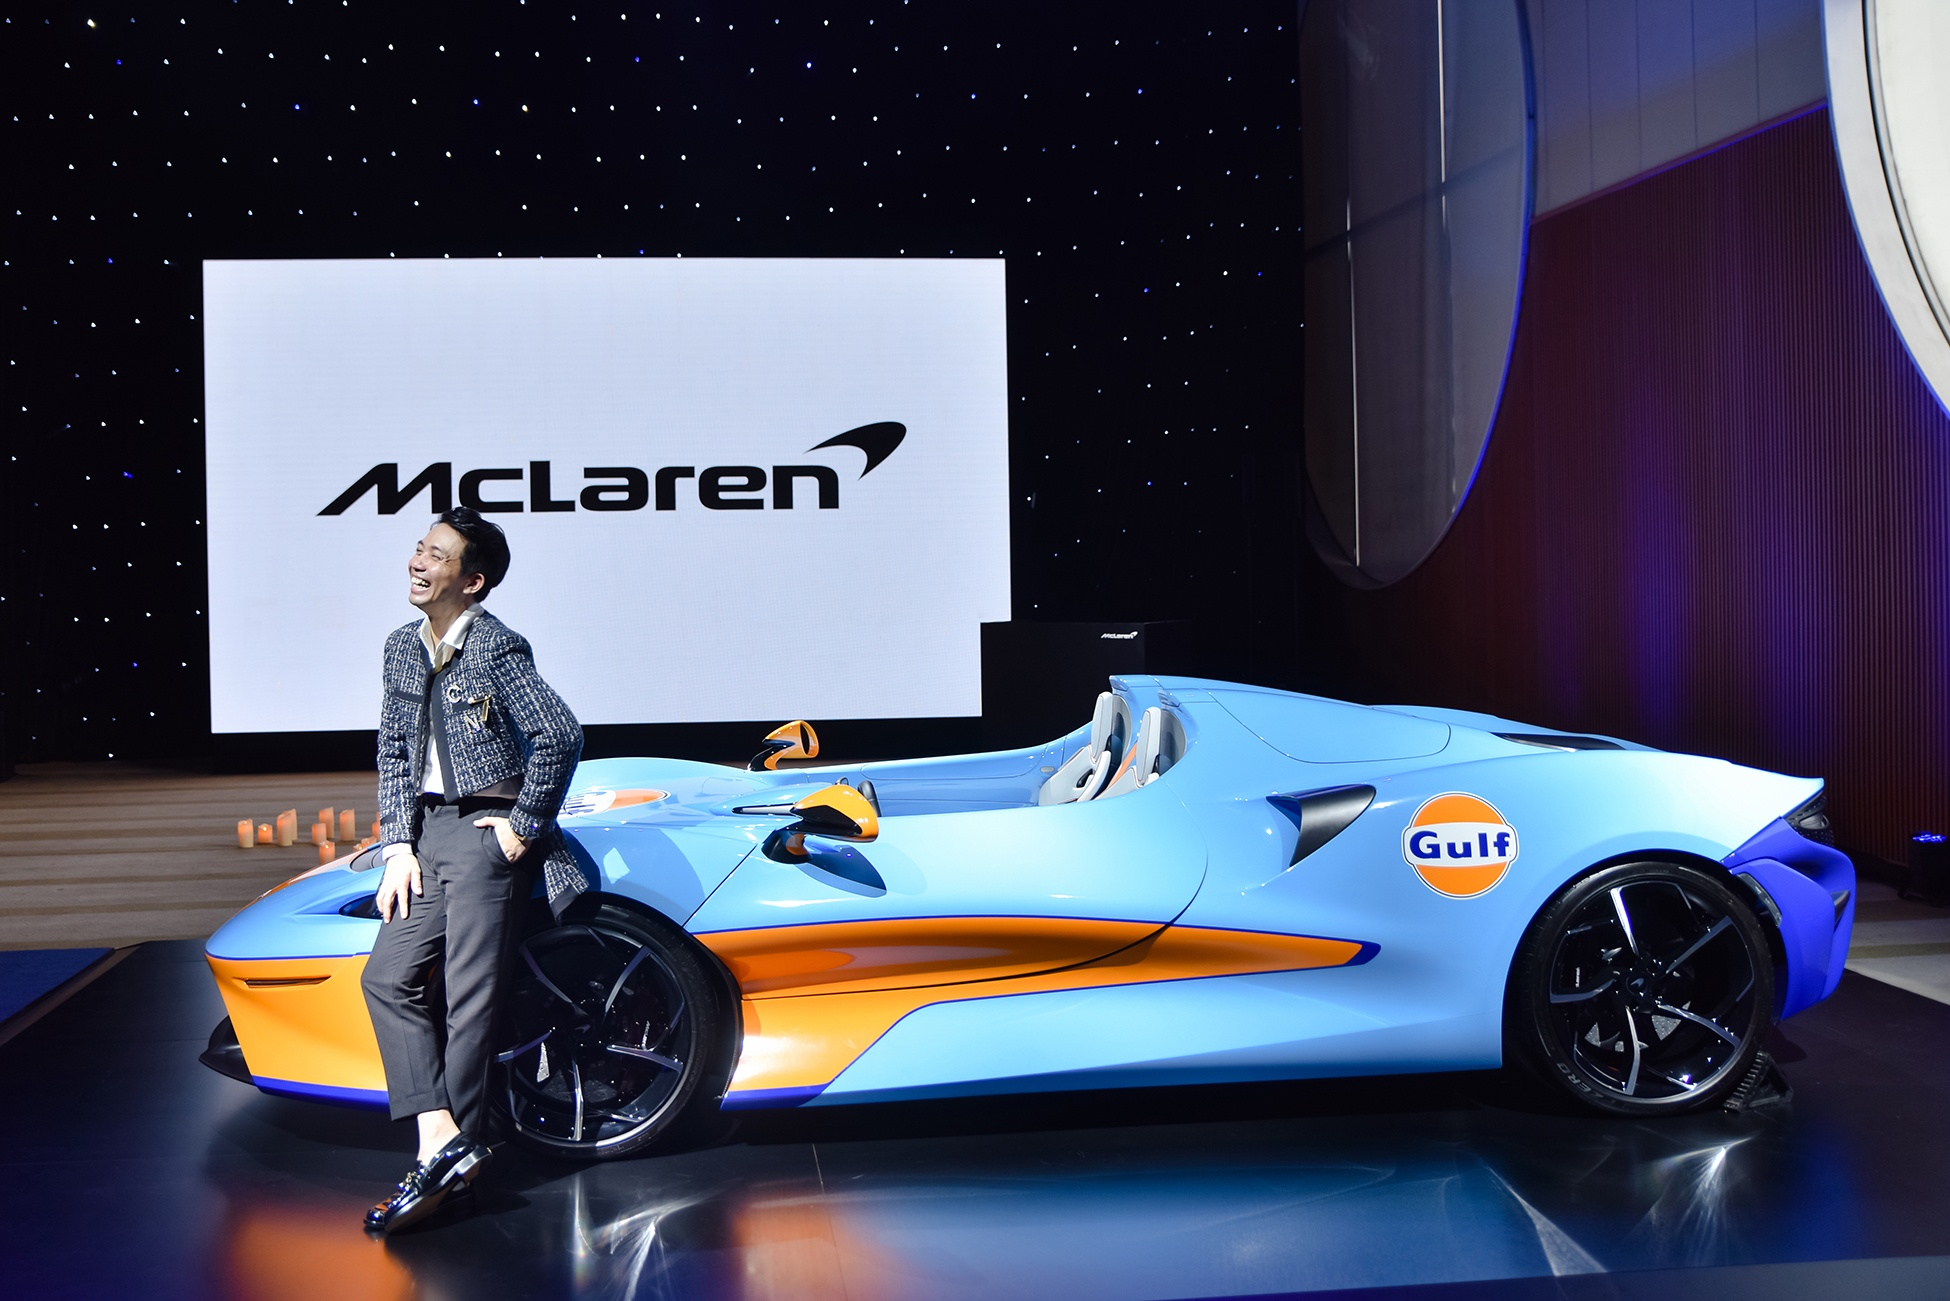 McLaren Elva xuat hien tai TP.HCM cung Minh Nhua anh 2